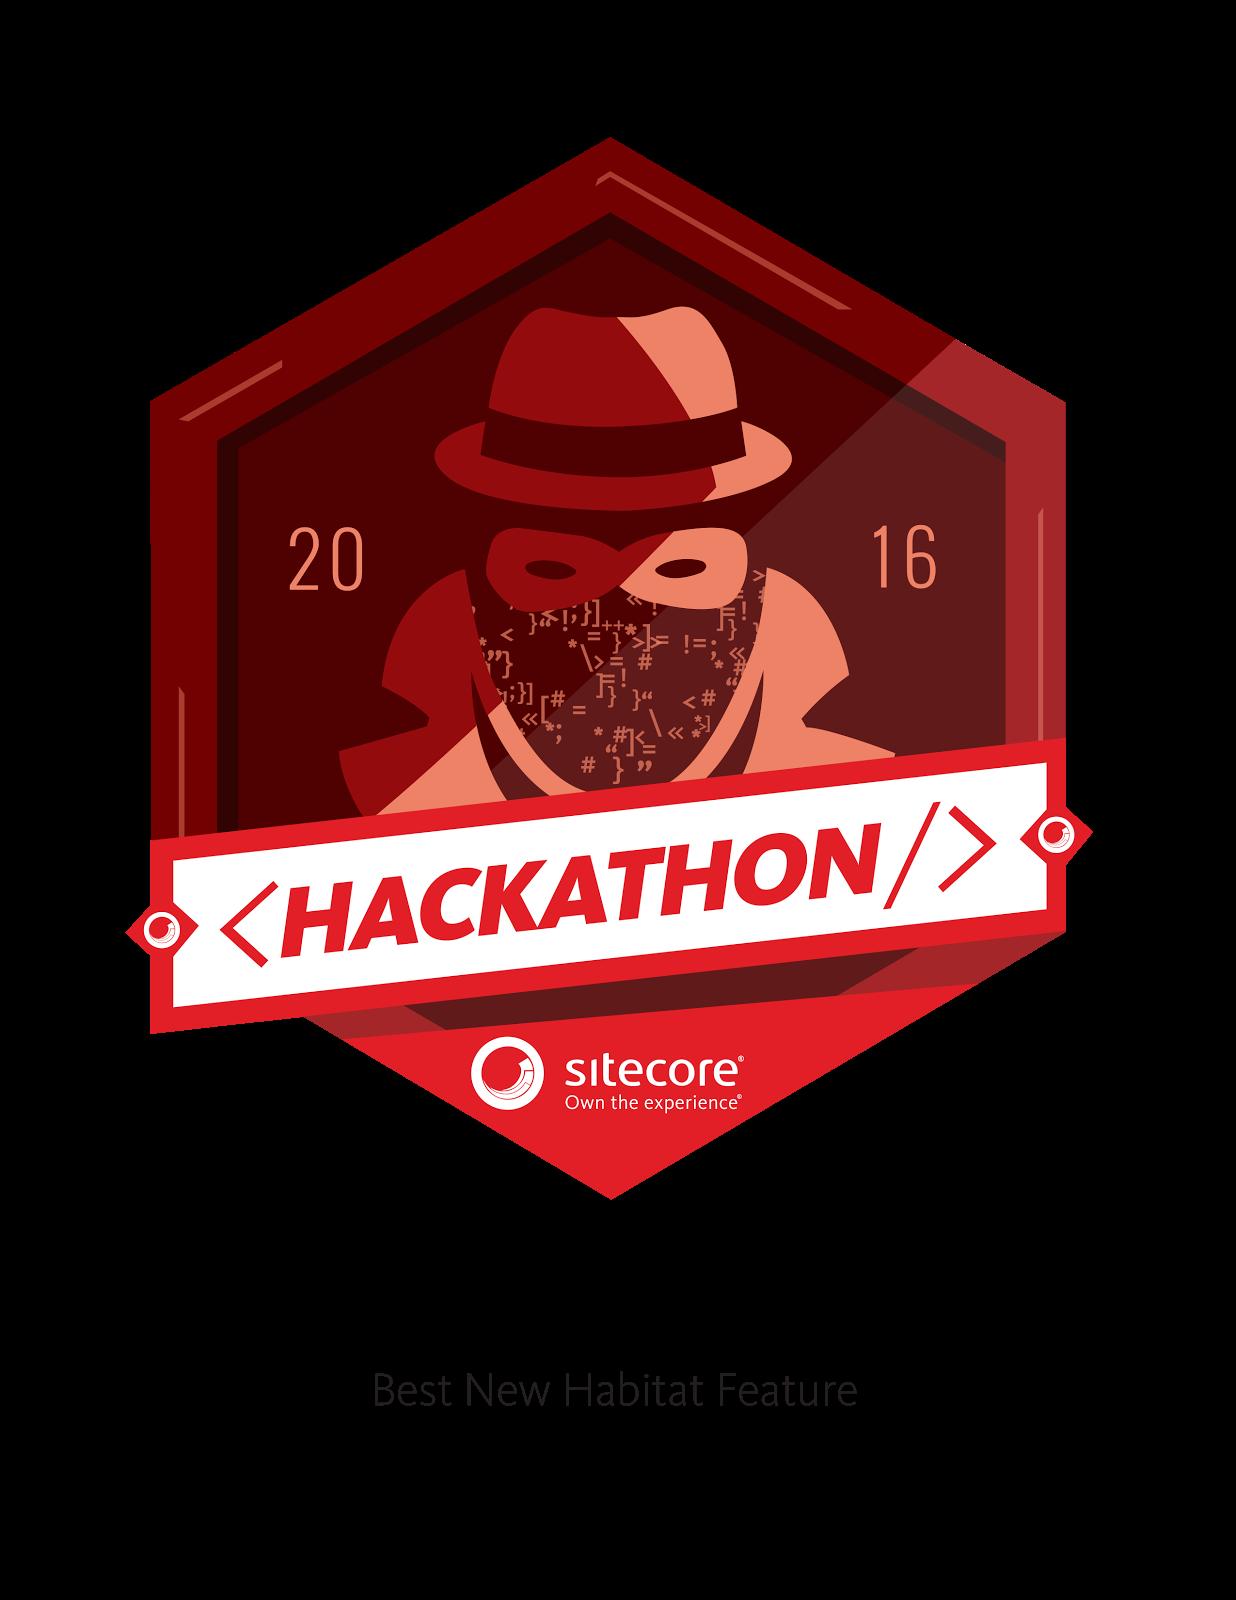 Sitecore hackathon 2016 winner team